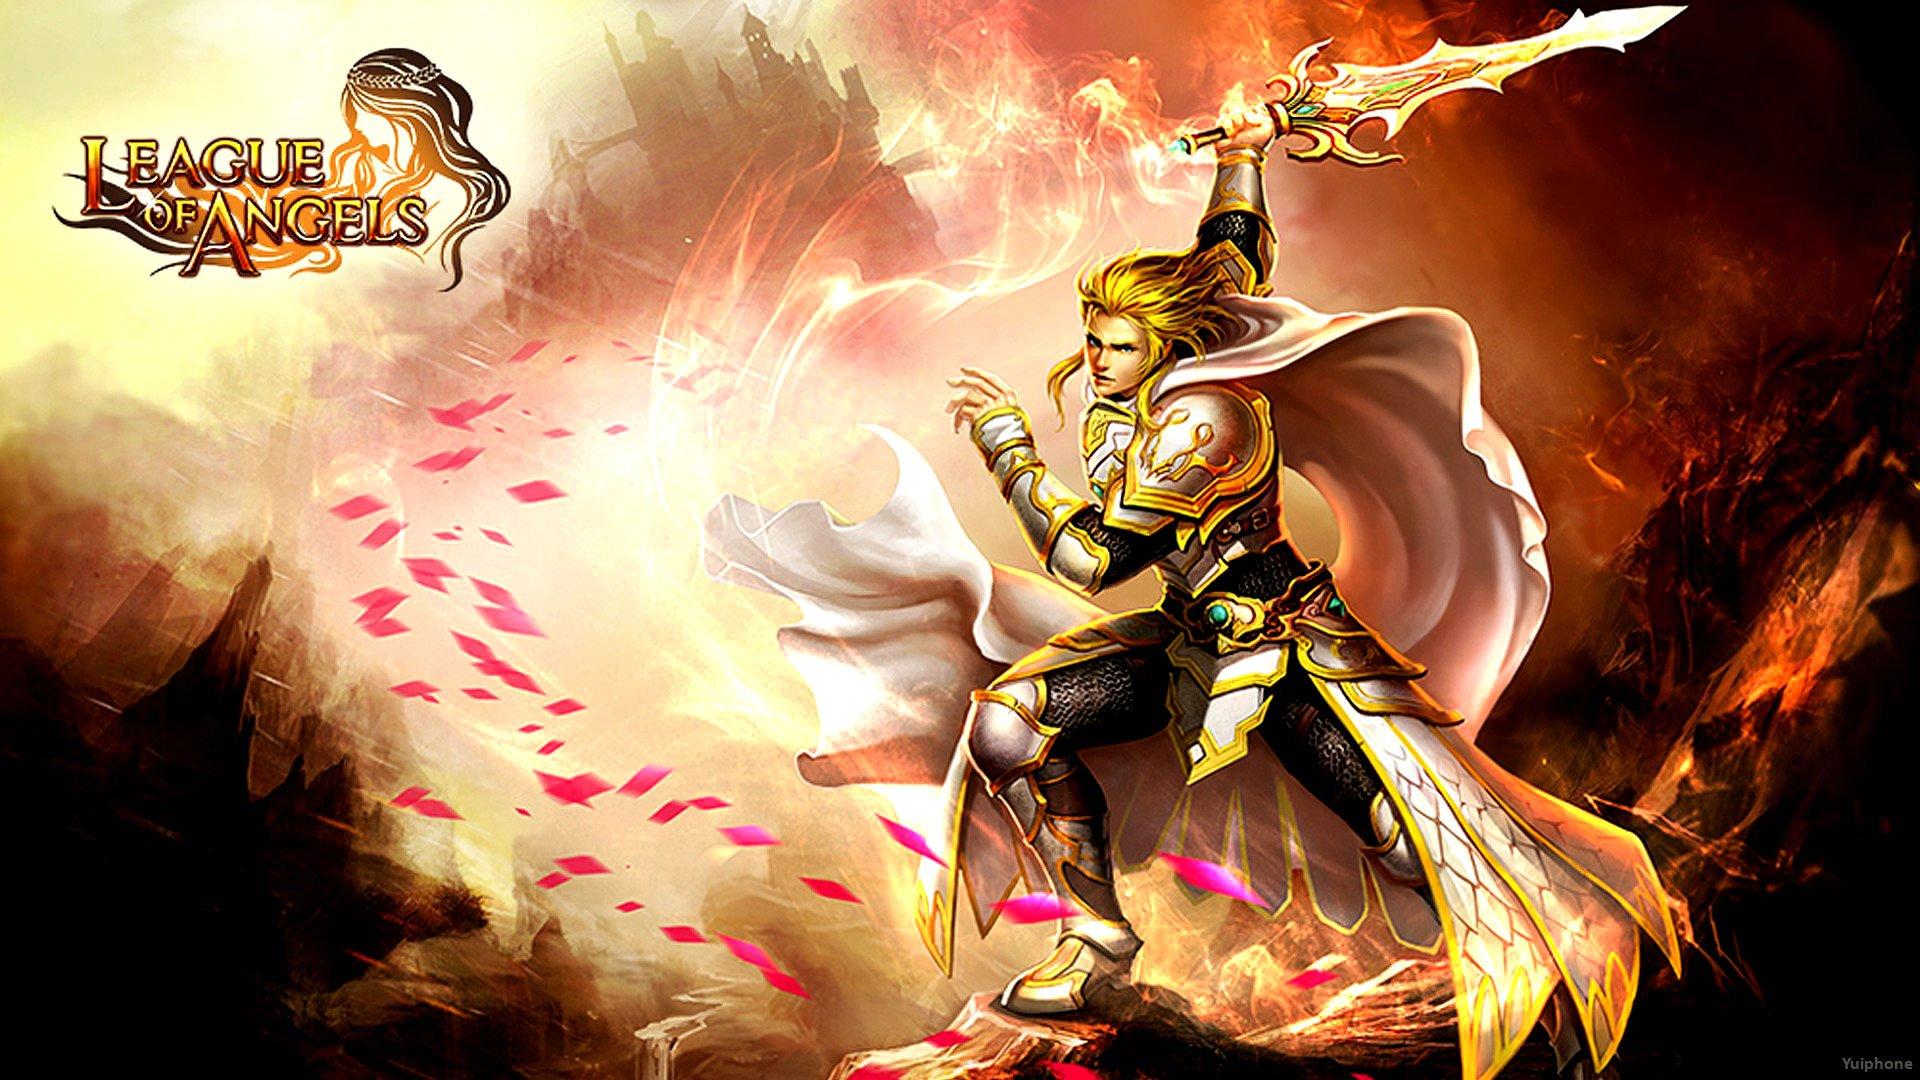 OF ANGELS fantasy angel warrior league angels game loa 19 wallpaper 1920x1080